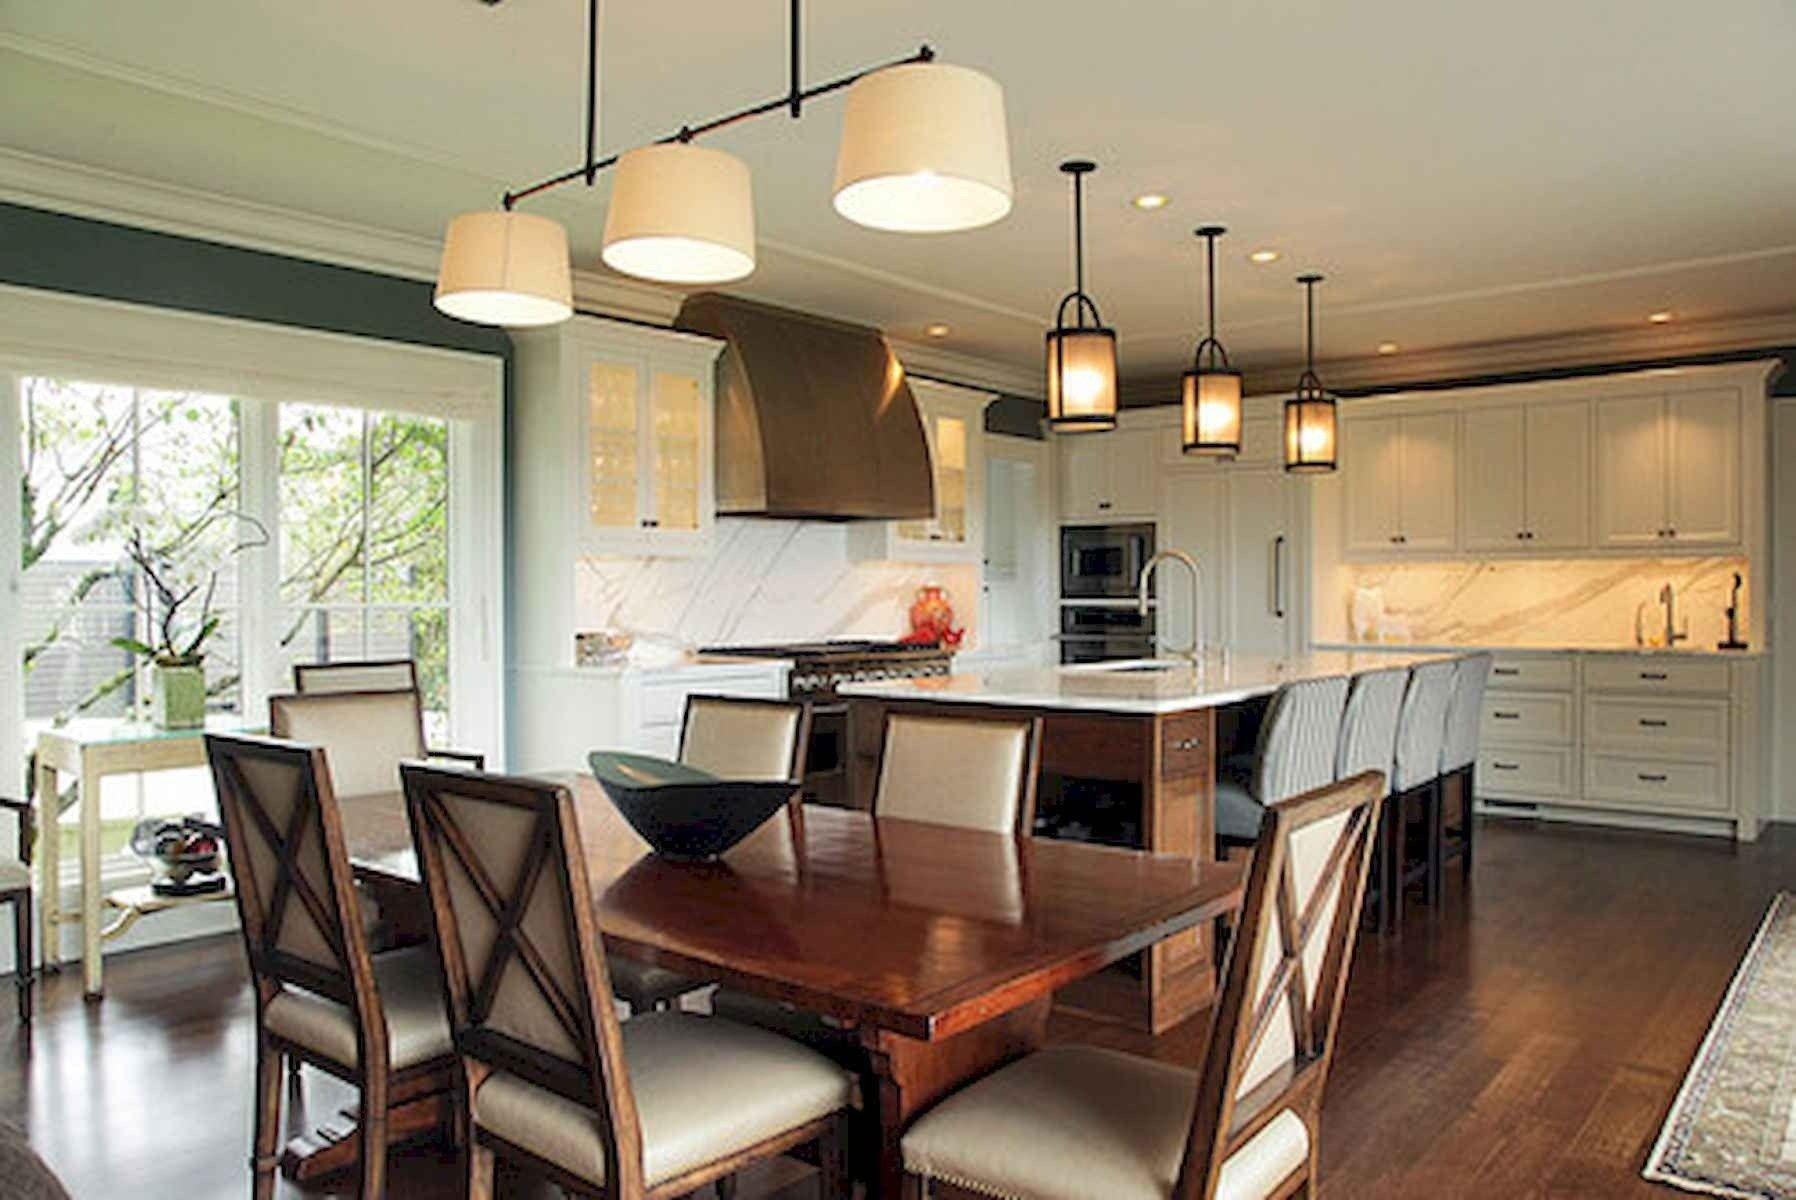 70 Farmhouse Dining Room Lighting Decor Ideas And Design Di 2020